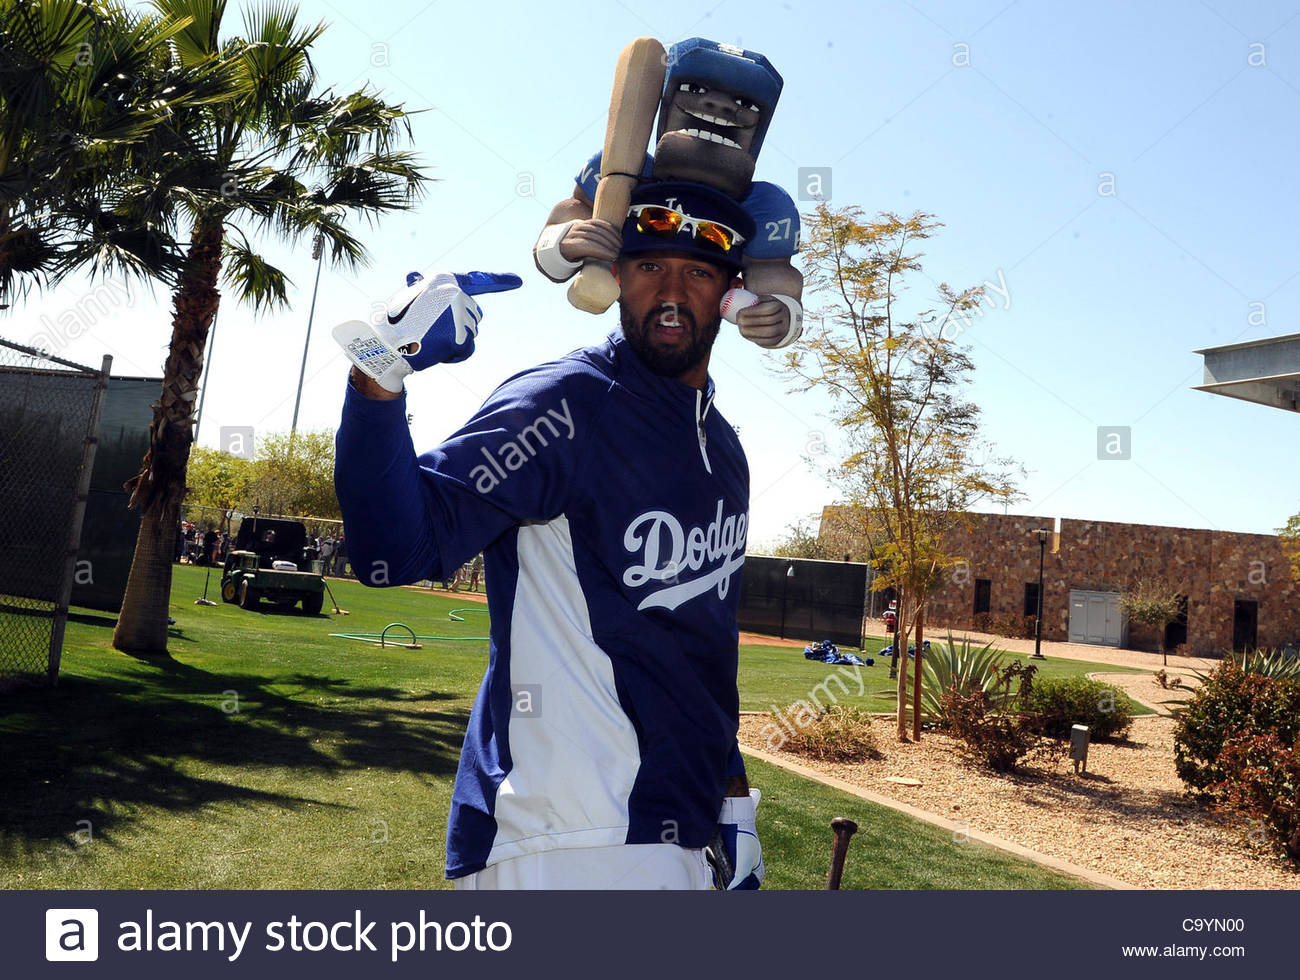 5f4a28fa3d12d Los Angeles Dodgers  Matt Kemp wears a hat a fan gave him before a spring